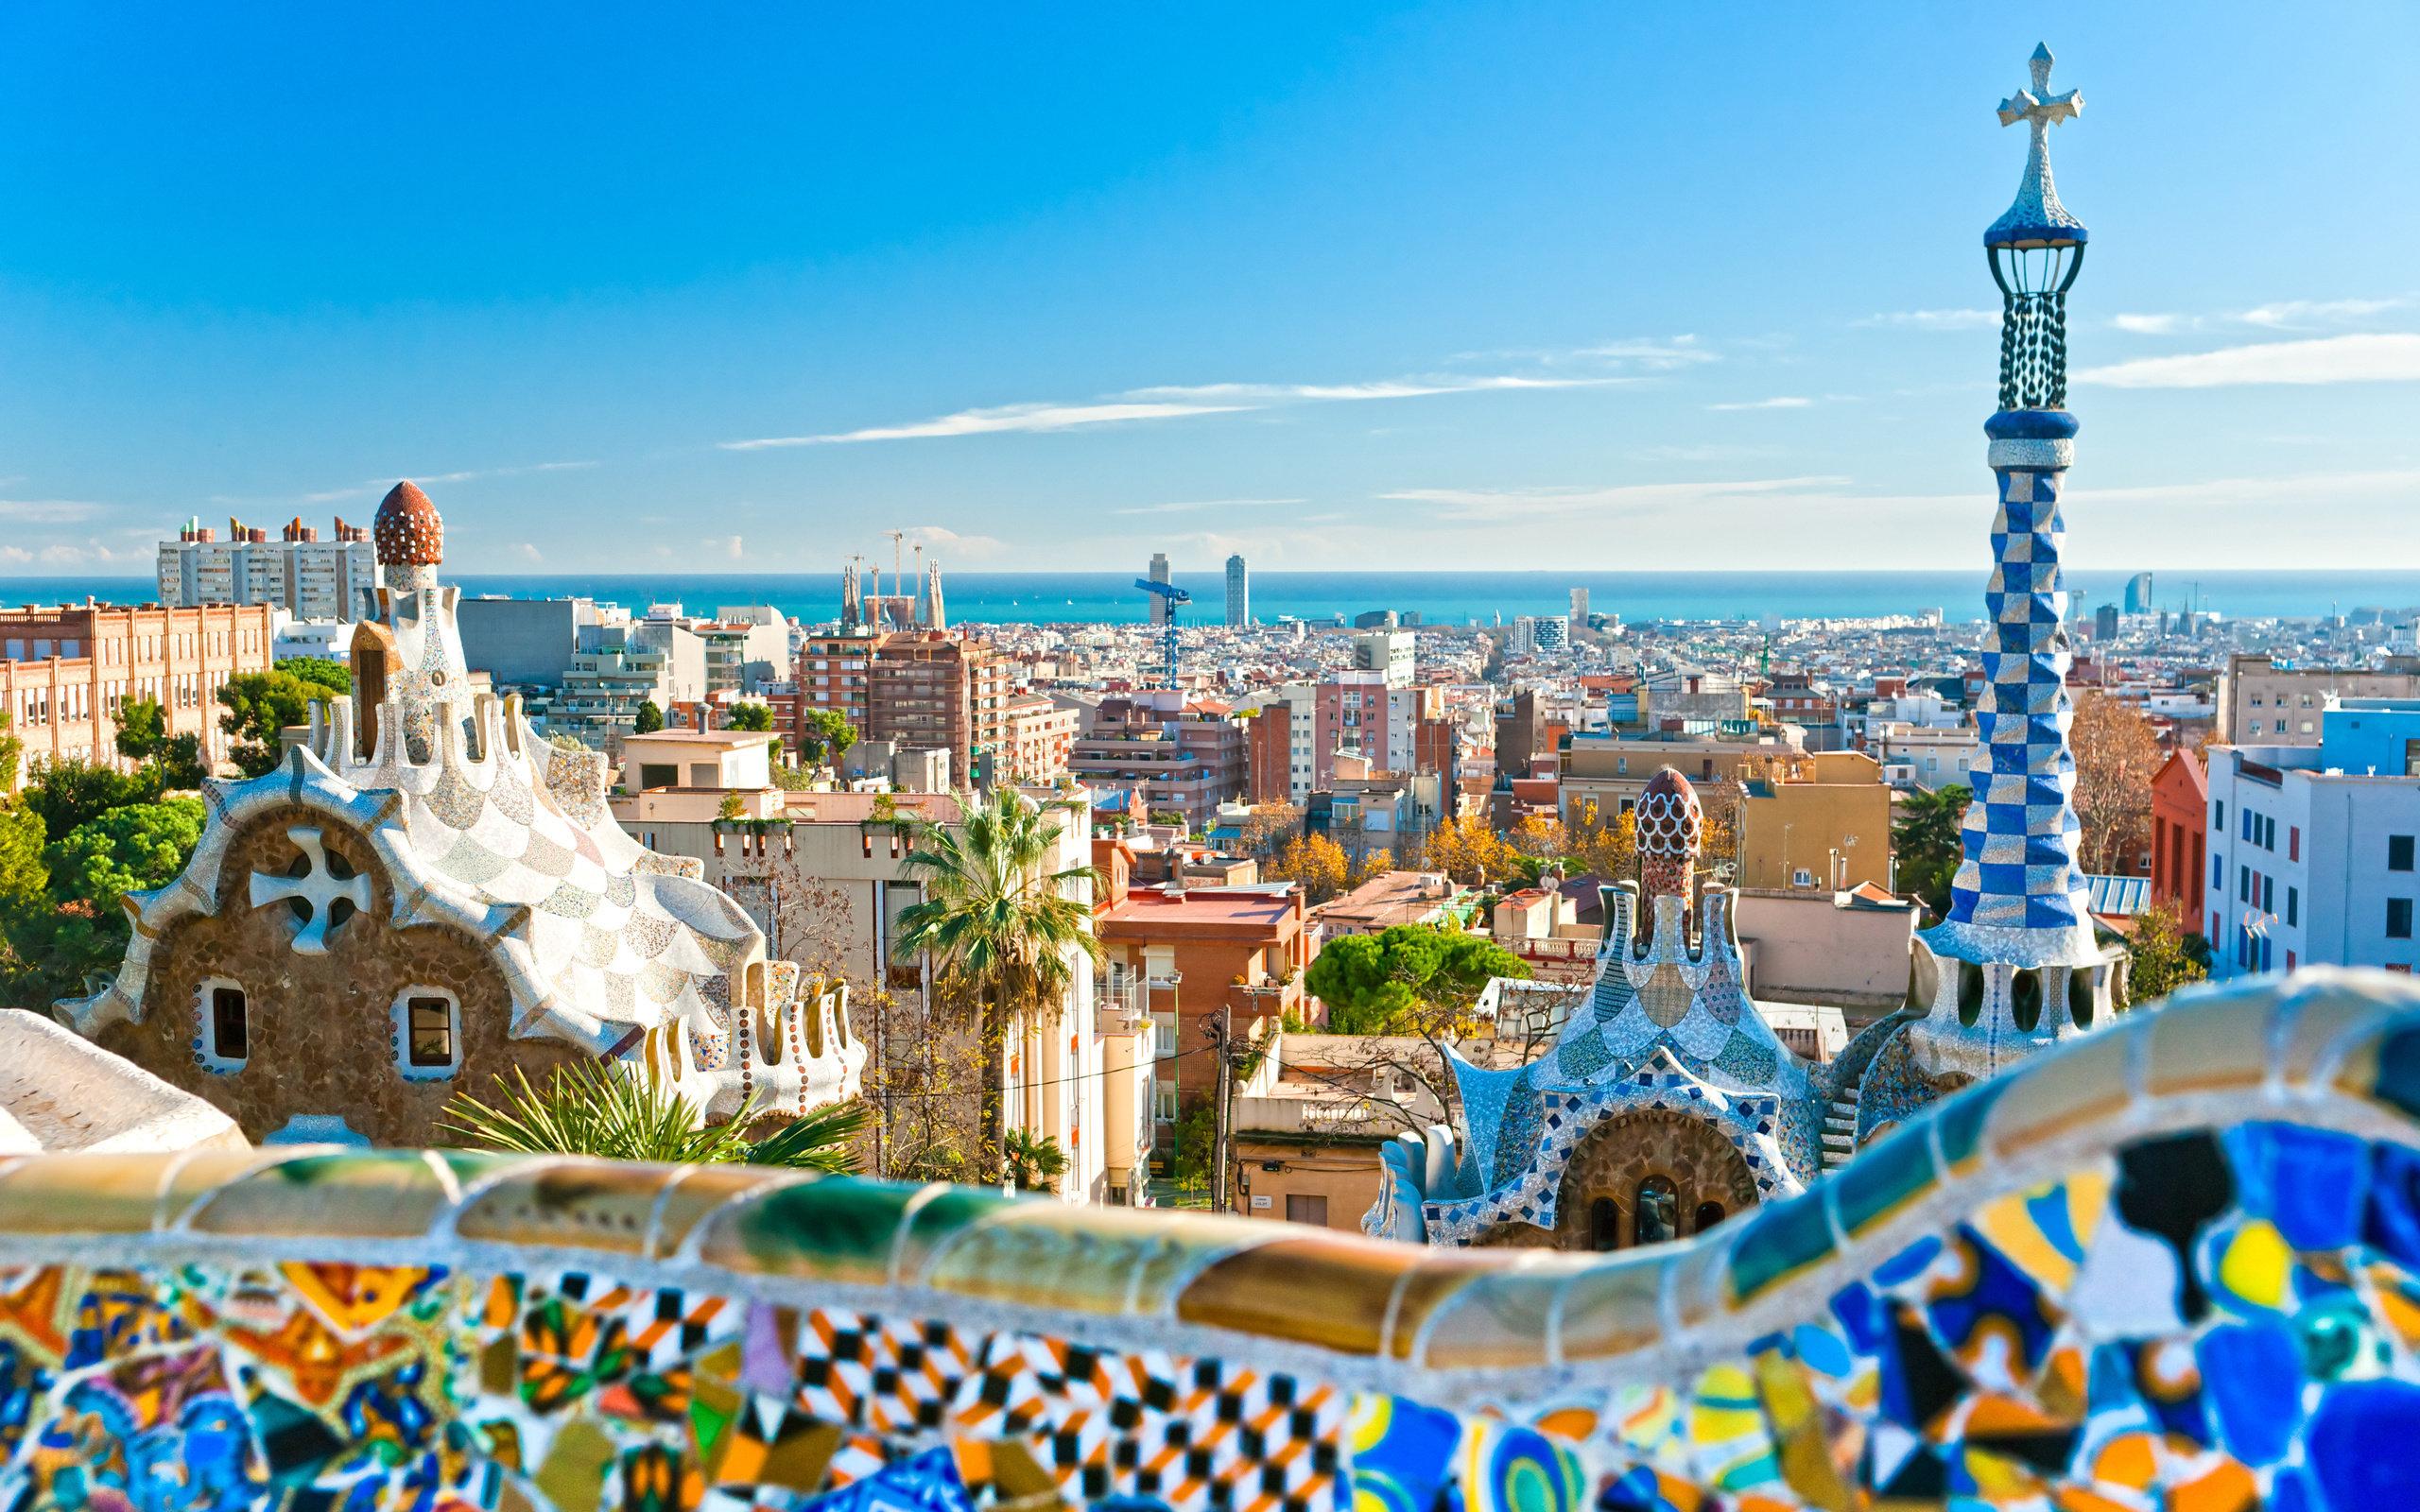 Barcelona Wallpapers HD For Desktop Backgrounds